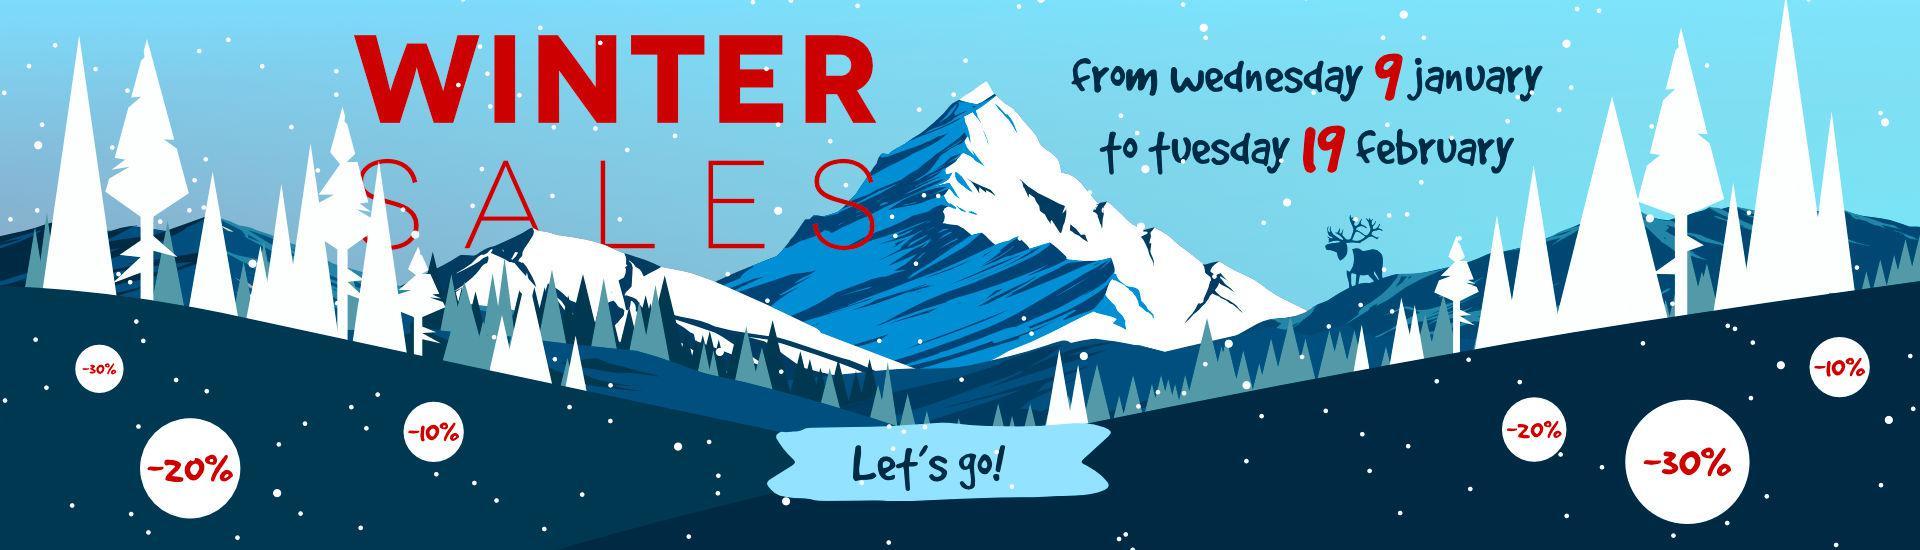 Winter Sales